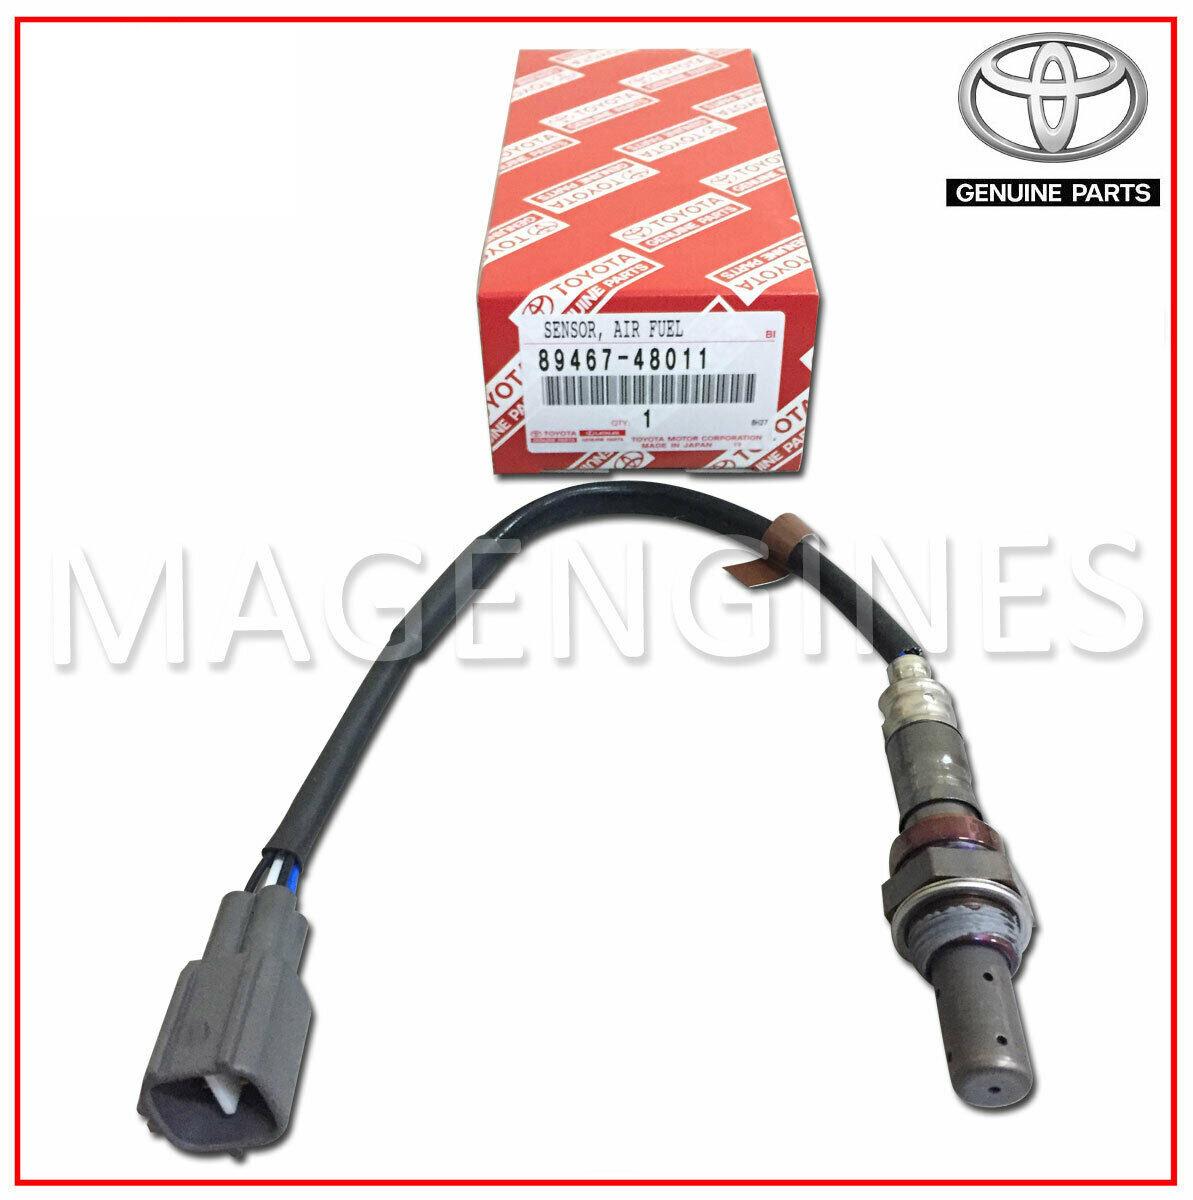 89467-48011 Air Fuel Ratio Sensor For Toyota Lexus Highlander Genuine Part